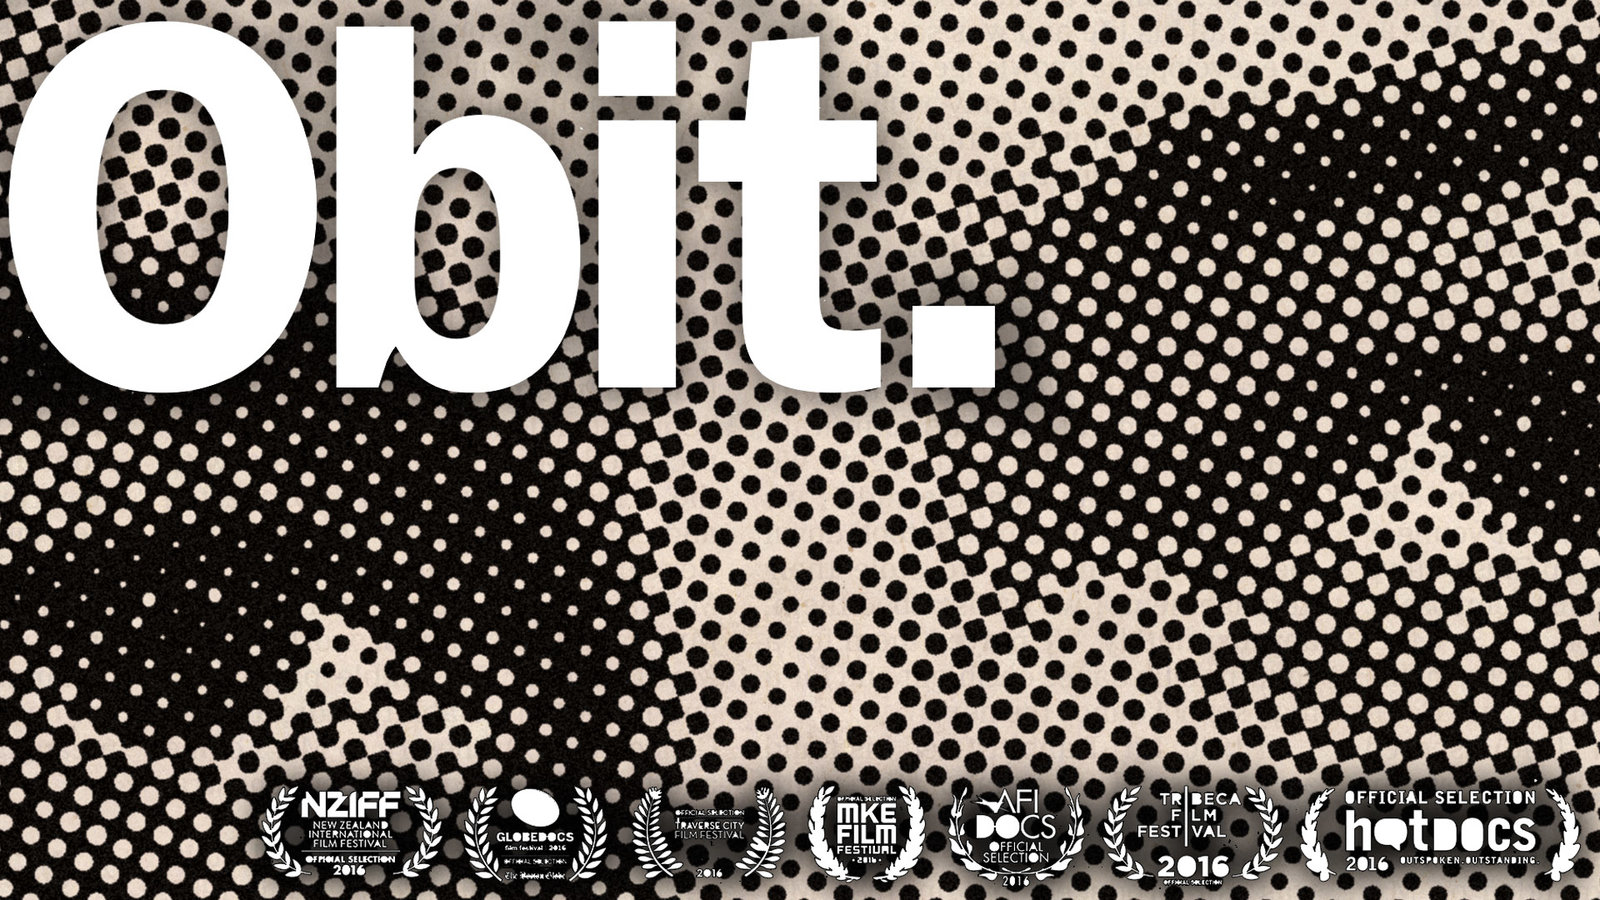 Obit. - The New York Times Obituary Writers